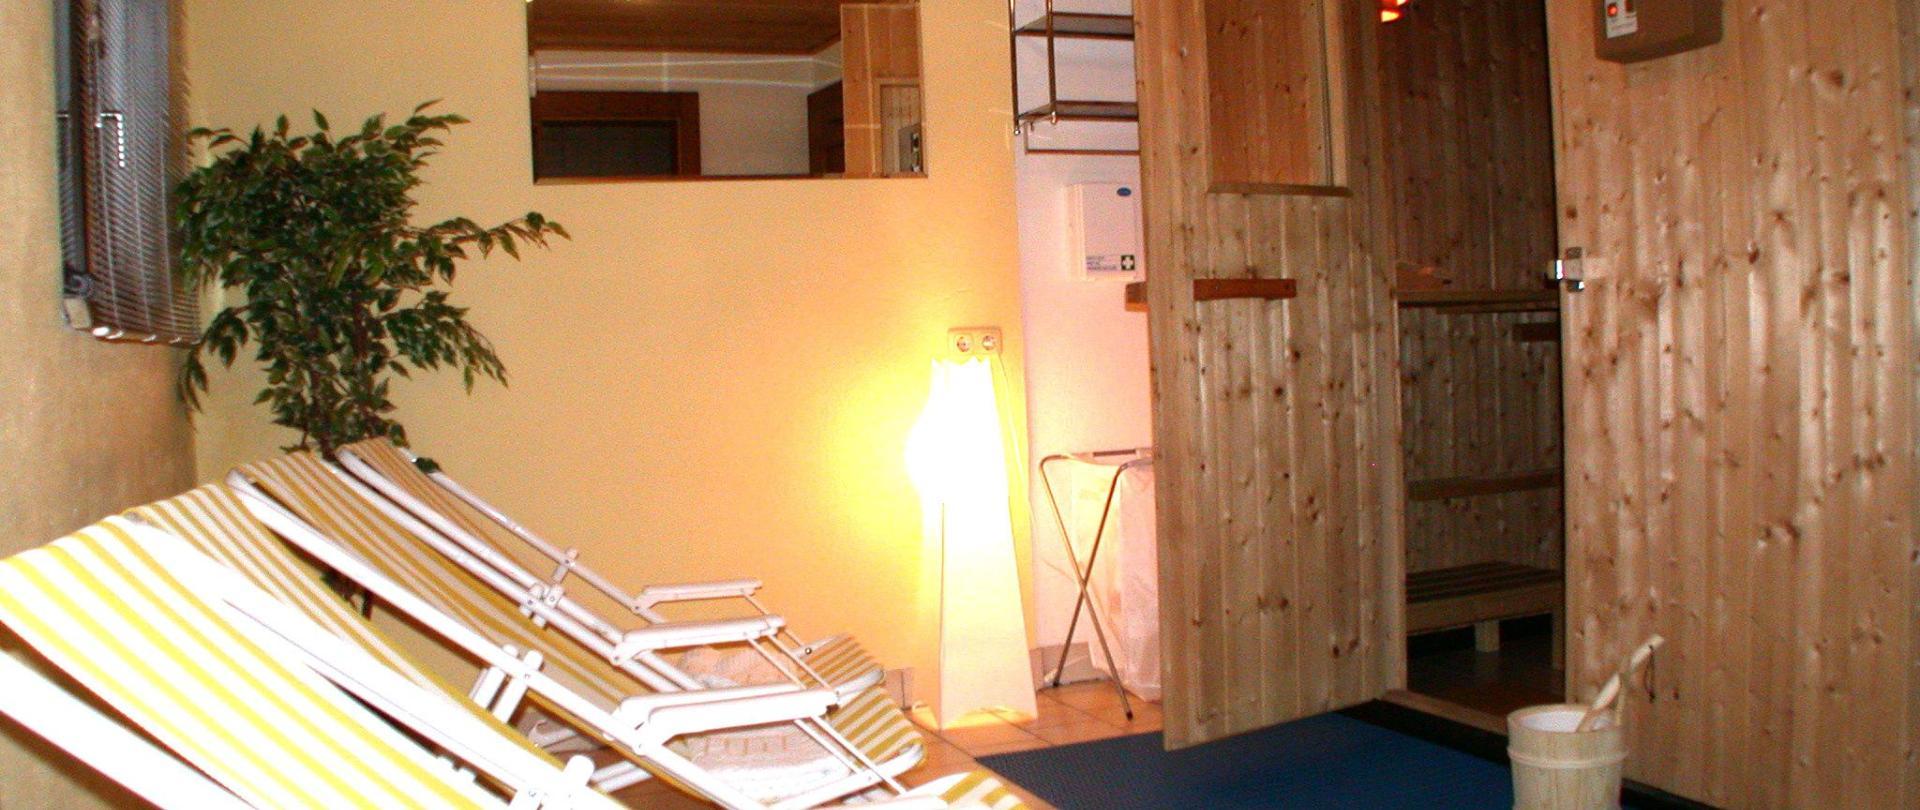 Sauna_Central.JPG